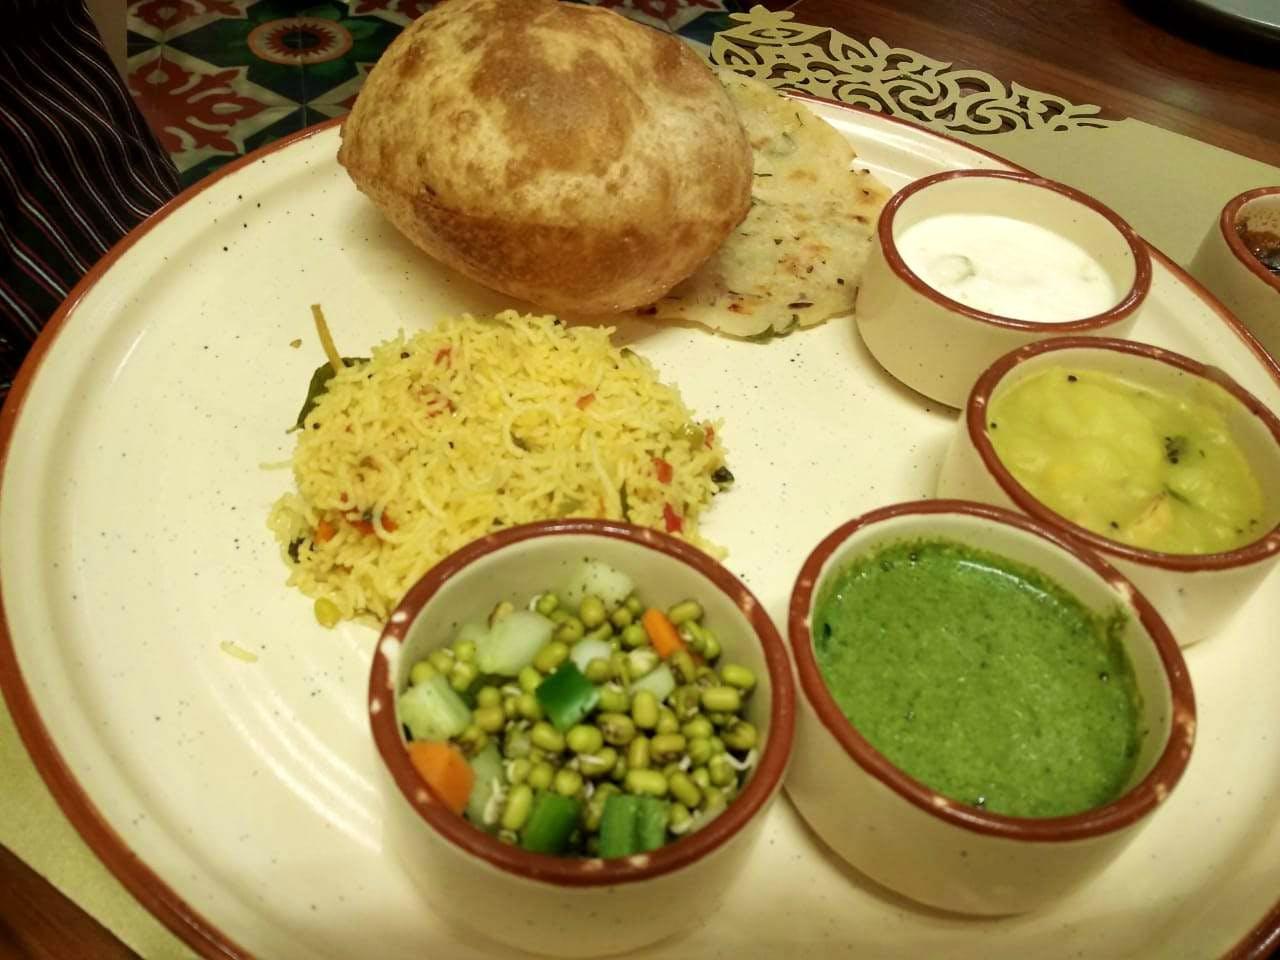 Dish,Food,Cuisine,Ingredient,Meal,Produce,Comfort food,Vegetarian food,Lunch,Indian cuisine